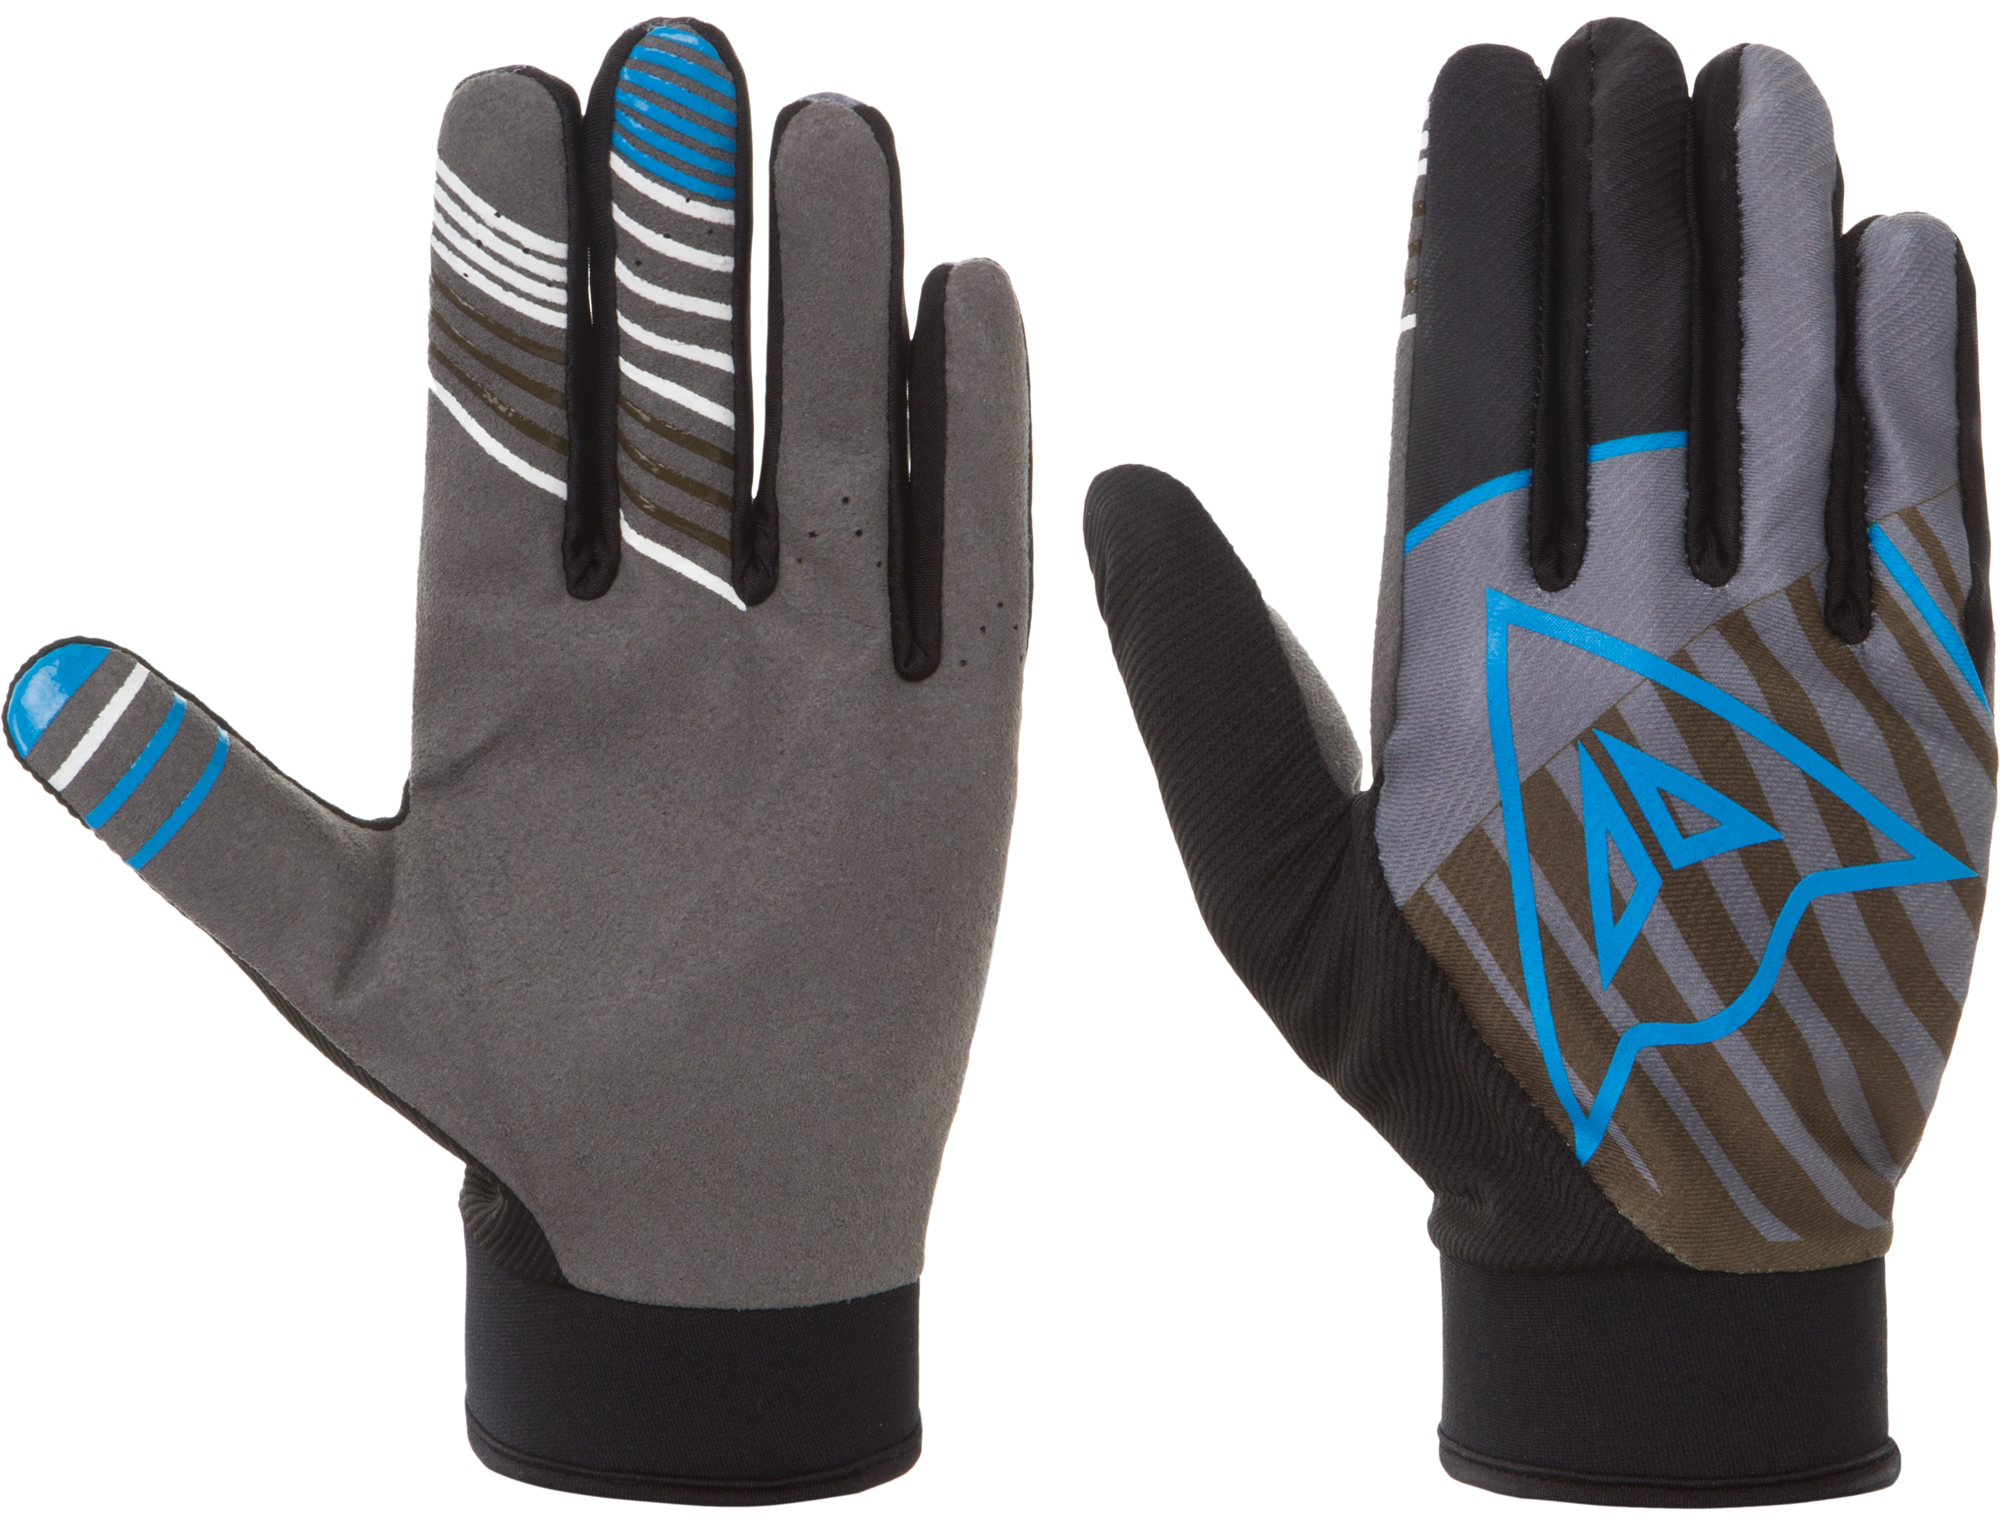 Dainese Велосипедные перчатки Dainese Dare, размер 7